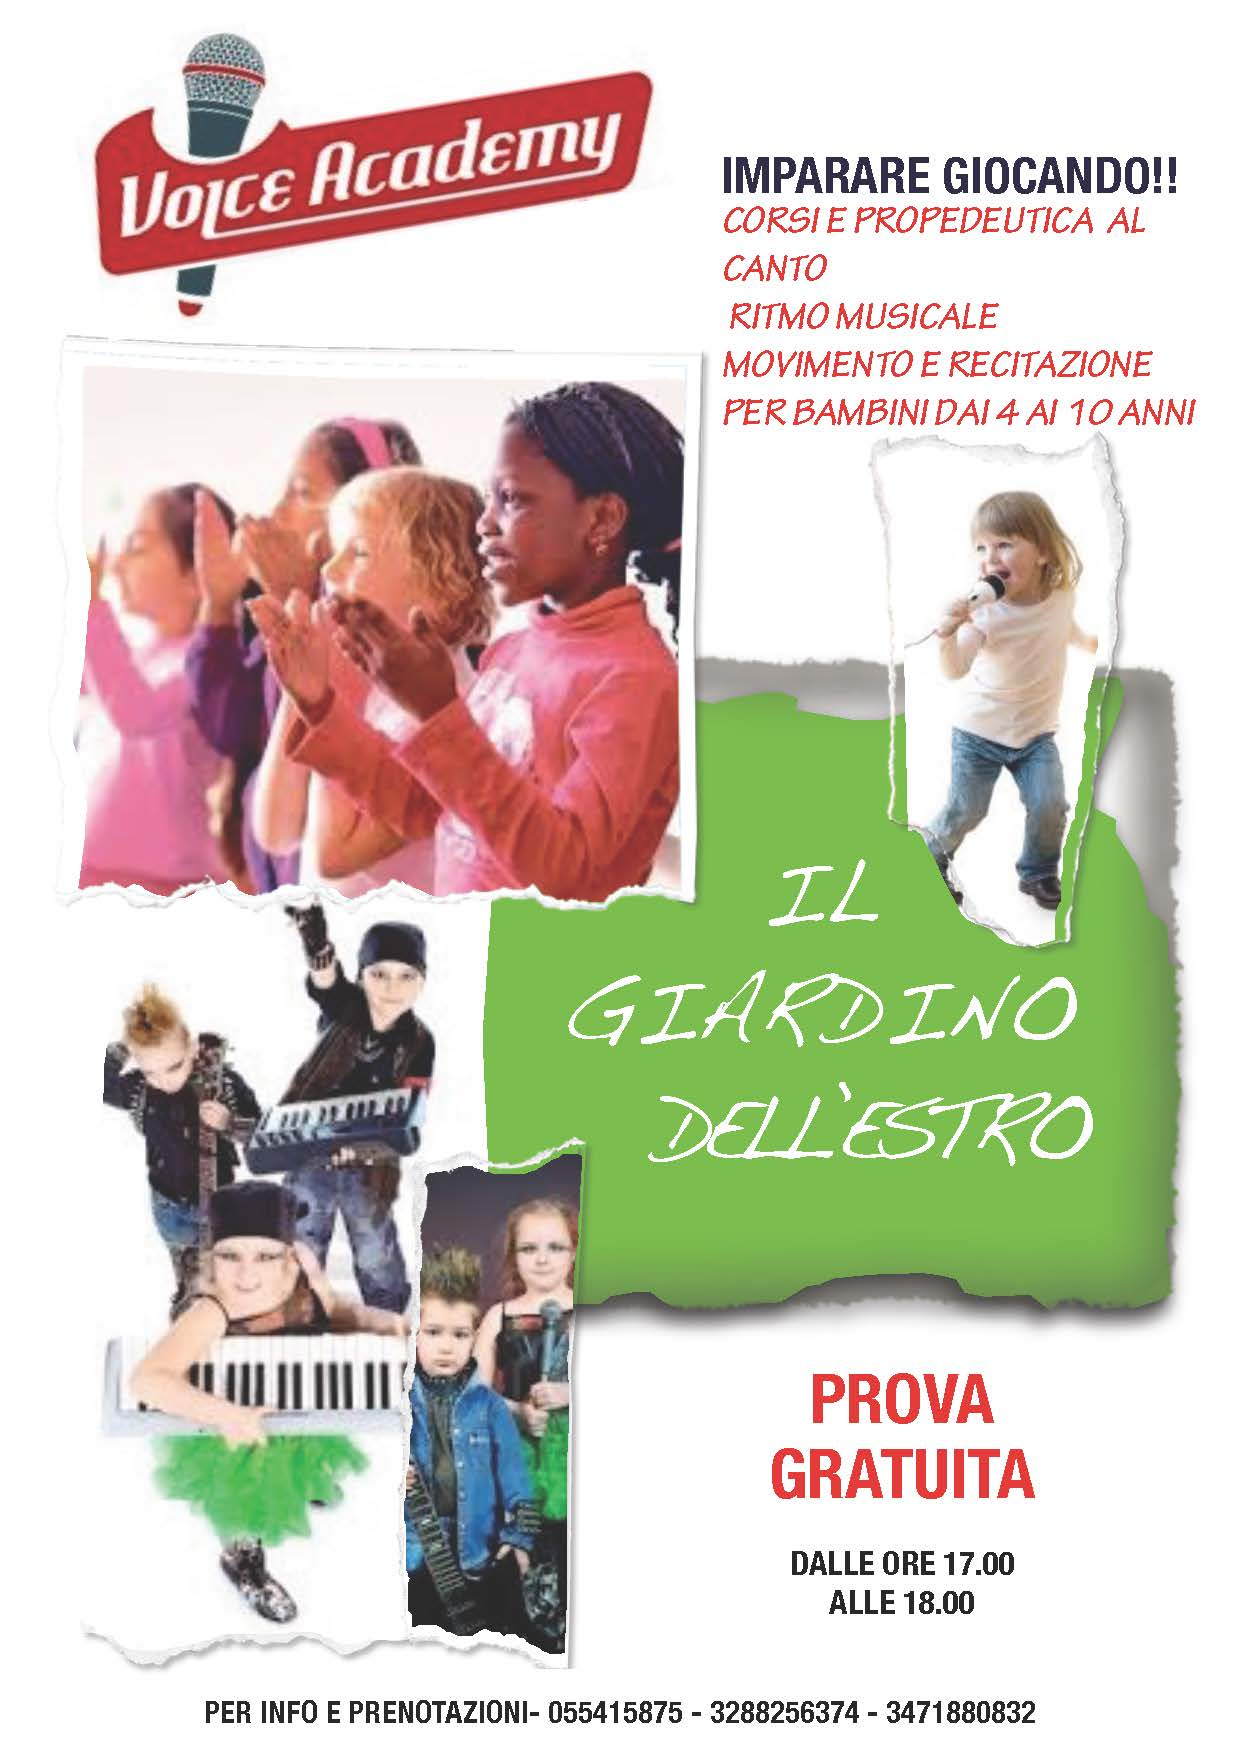 Ai vostri bambini piace cantare? Allora c'è Voice Academy a Firenze